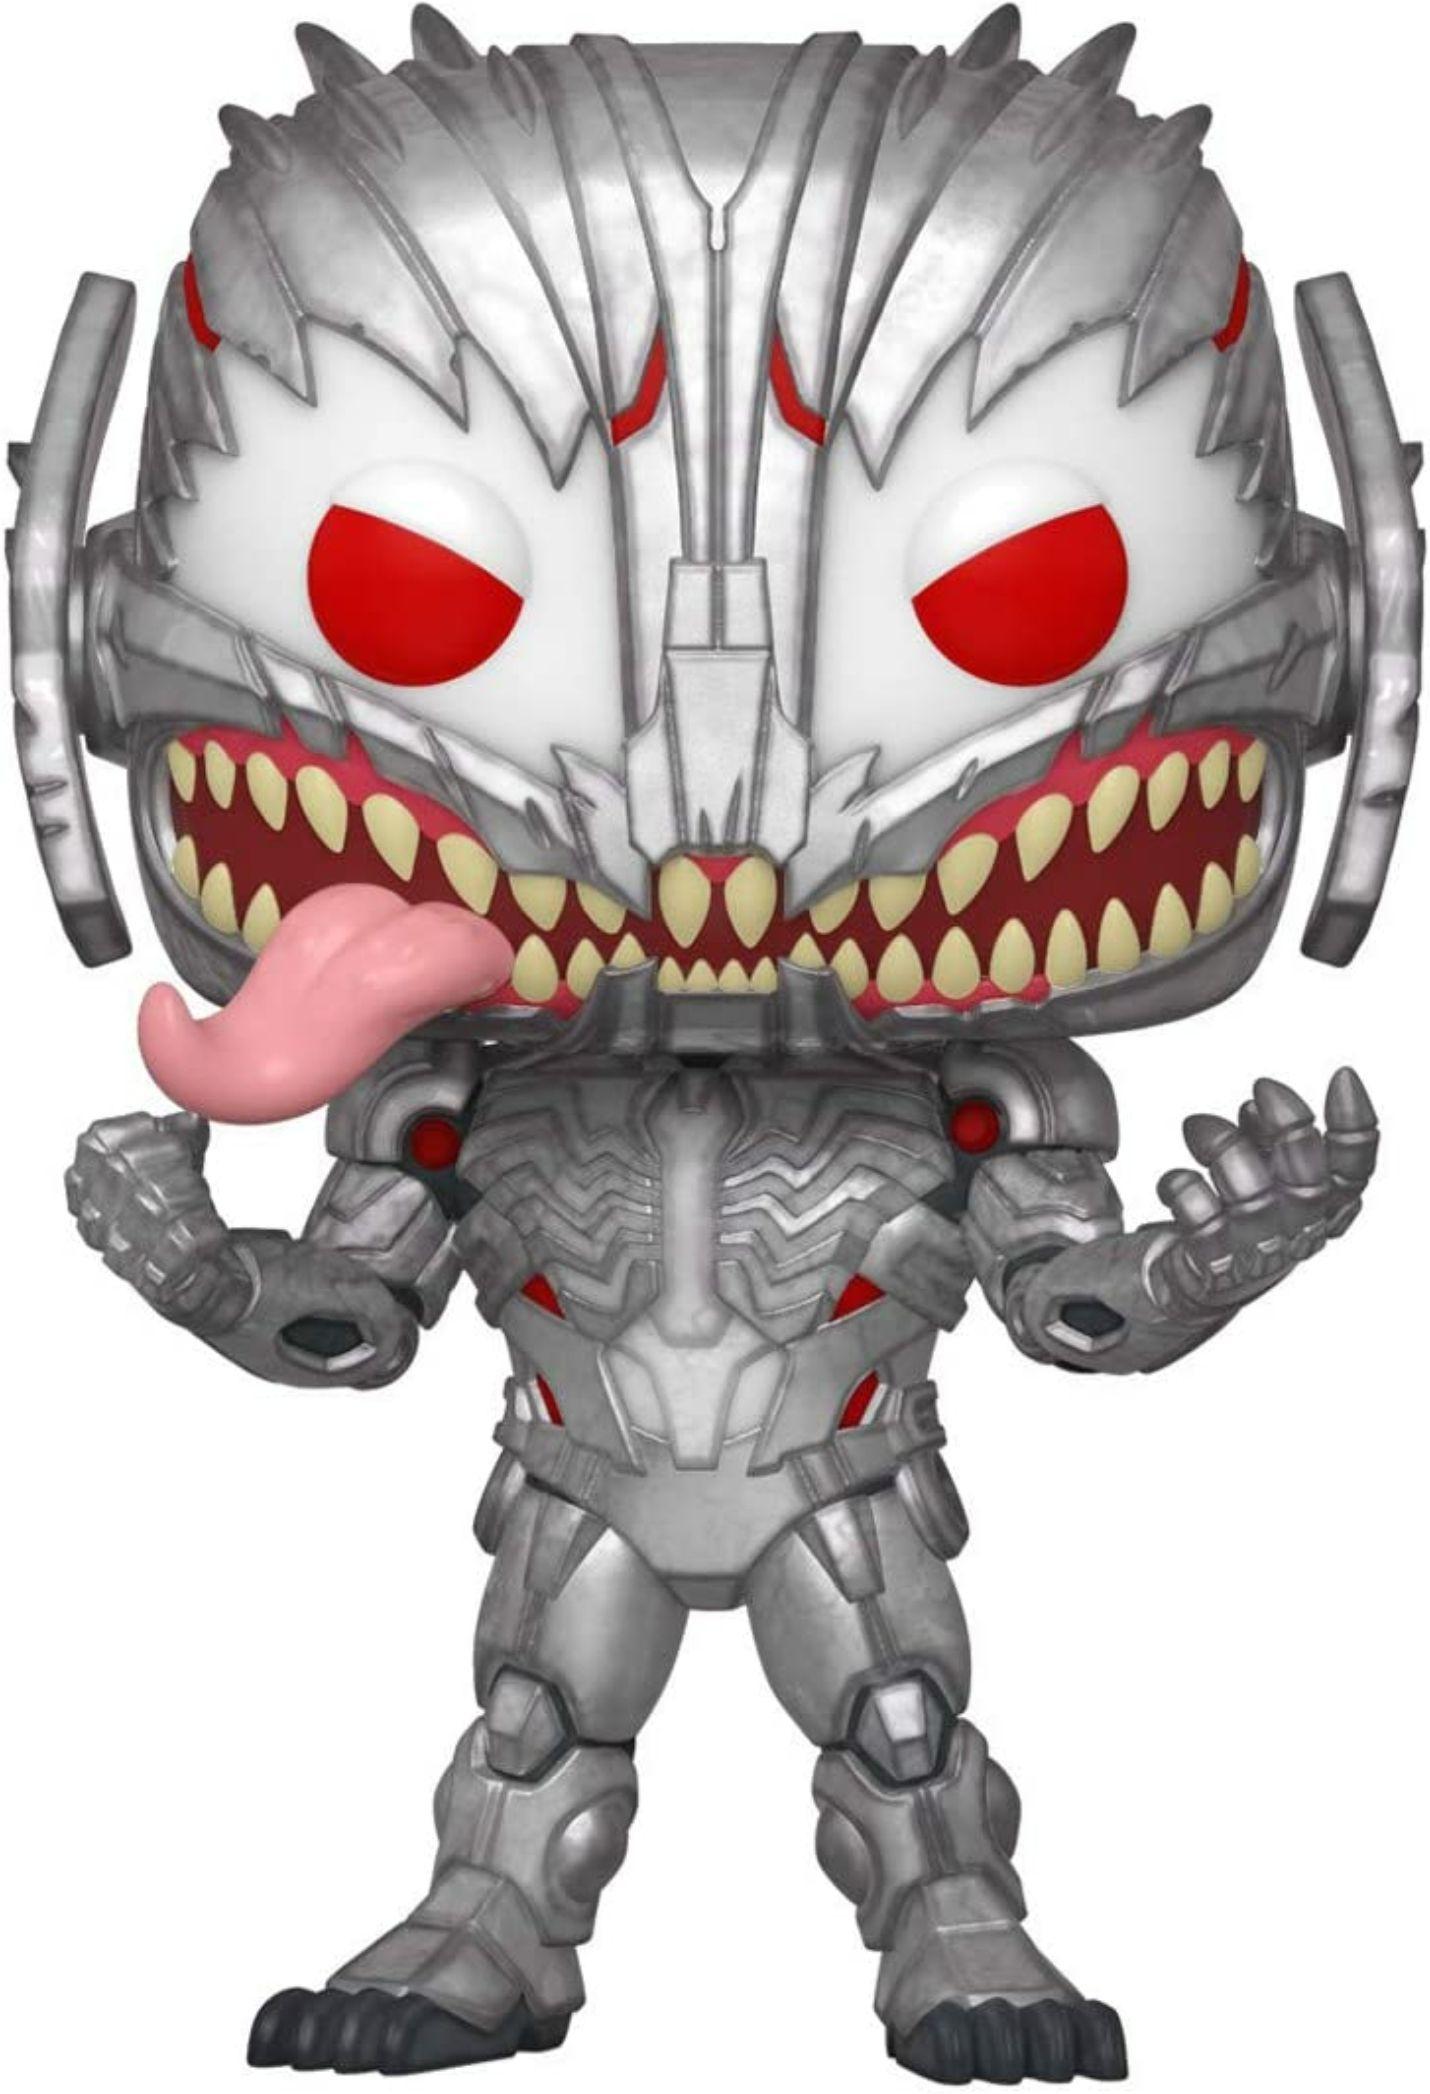 Funko - Pop! Marvel: Marvel Venom S3 - Ultron